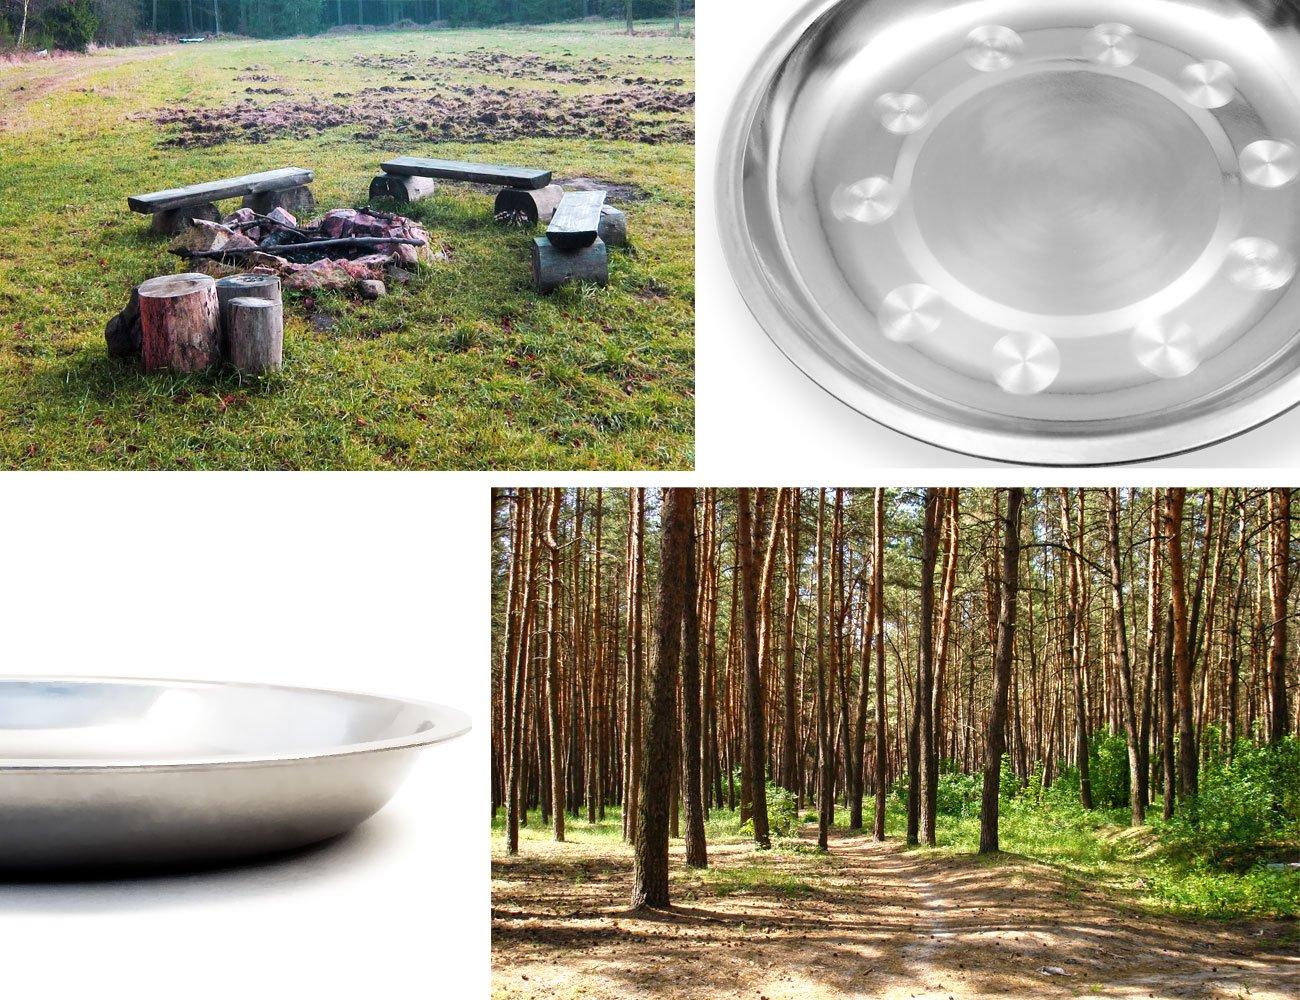 6/x camping/ /Juego de picnic/ Outdoor saxx/®/ Cuchillo, Tenedor, Cuchara, irrompible, acero inoxidable, 8/piezas /2/x camping Plato /Ø17/cm /Cuberter/ía plegable